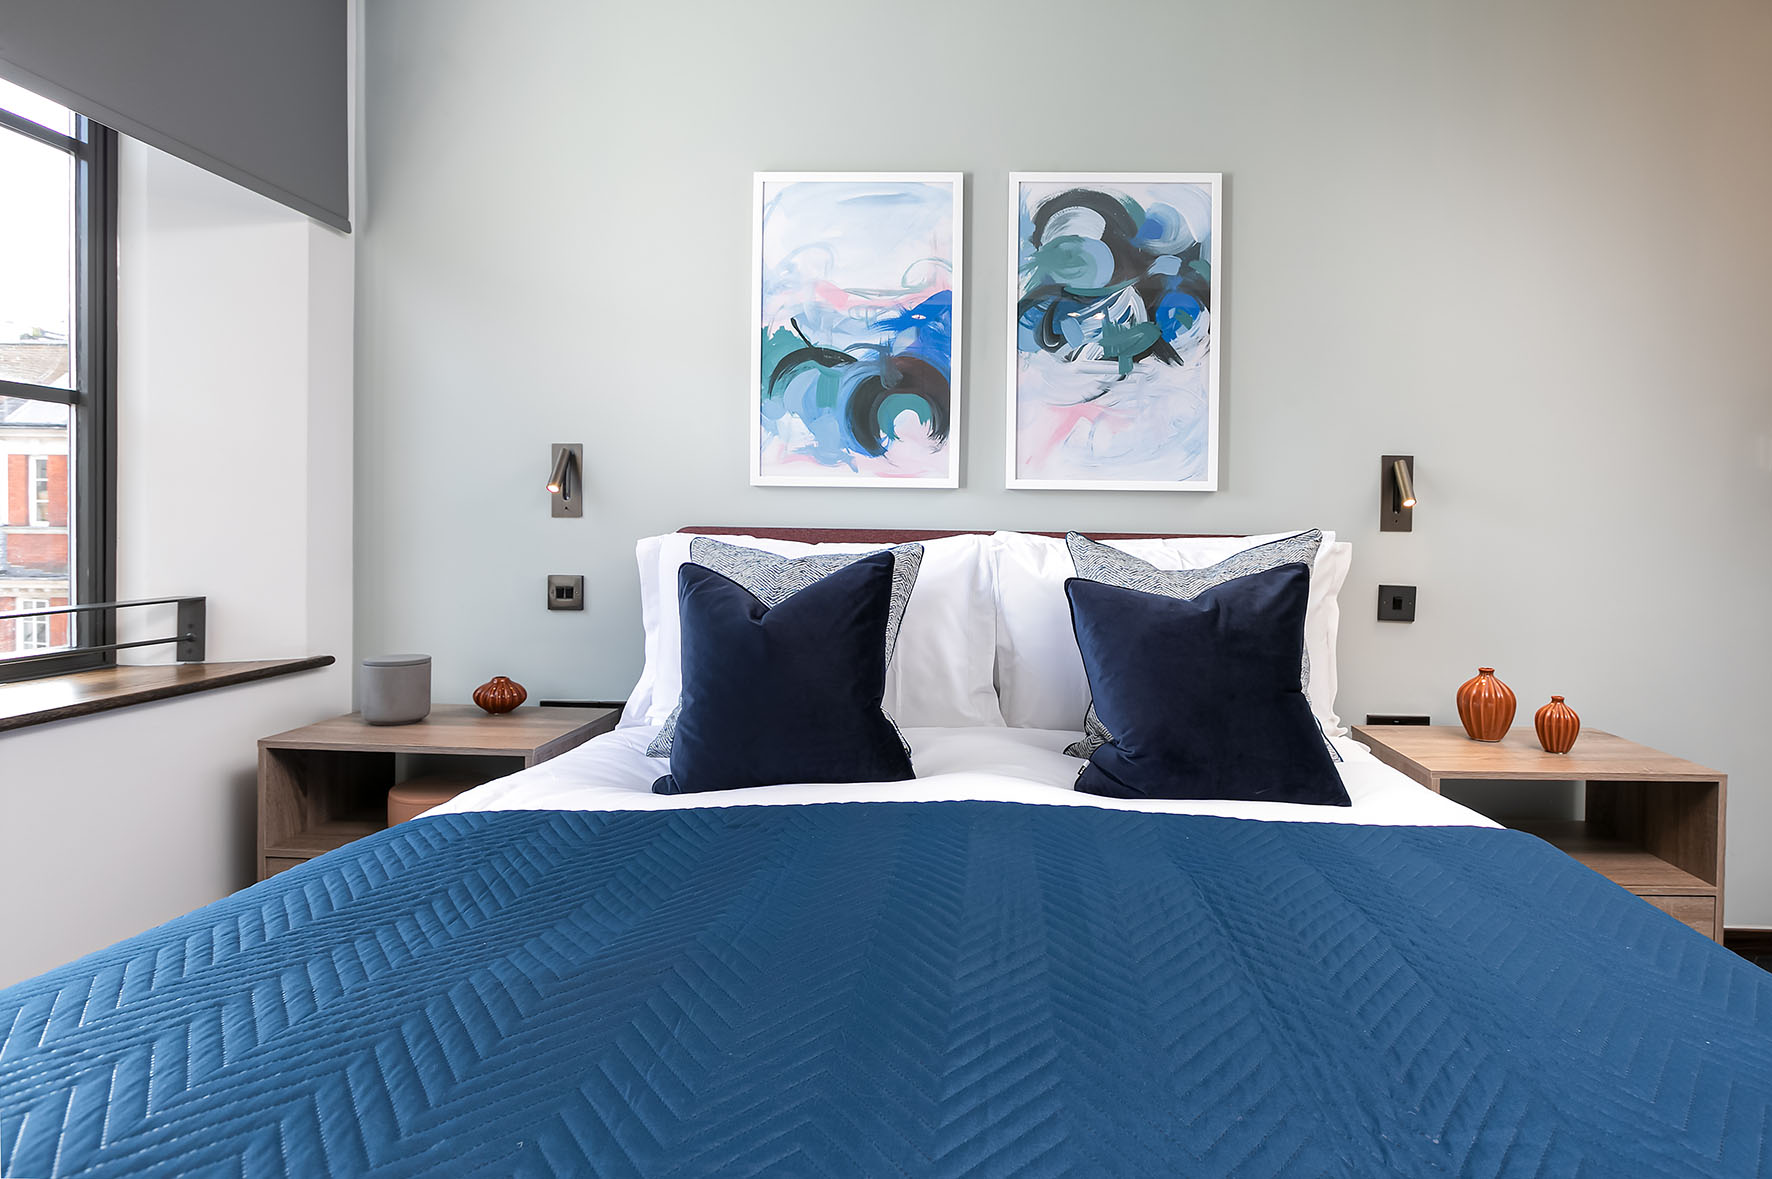 Lovelydays luxury service apartment rental - London - Soho - Noel Street VI - Lovelysuite - 2 bedrooms - 2 bathrooms - Queen bed - a5c43f3aa6a3 - Lovelydays